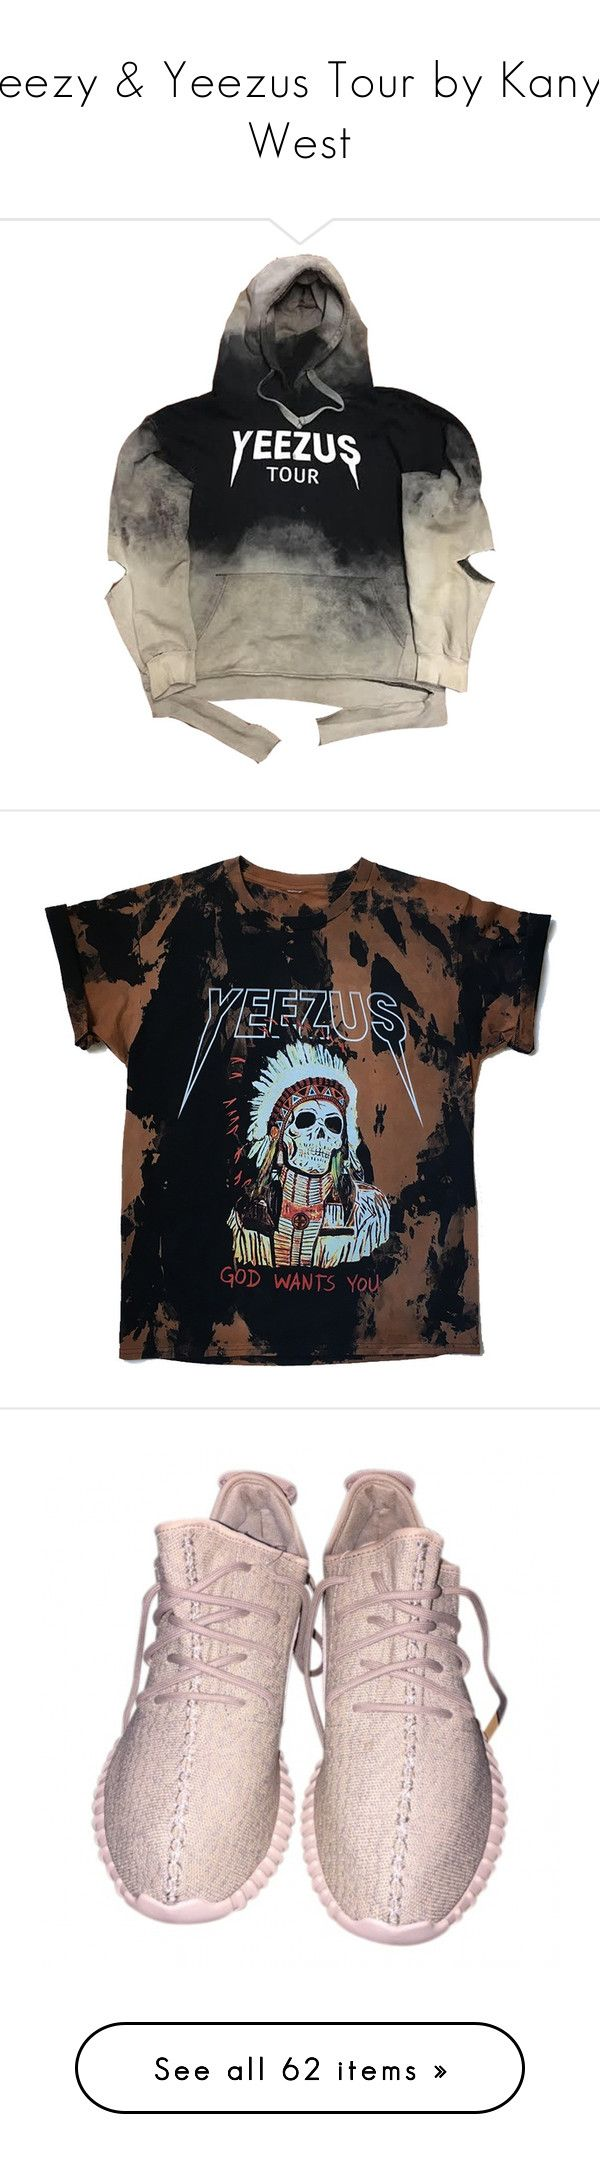 """Yeezy & Yeezus Tour by Kanye West"" by aneteas ❤ liked on Polyvore featuring tops, hoodies, sweaters, jackets, jumper, hooded sweatshirt, hoodie top, rock tops, distressed top and rock hoodie"